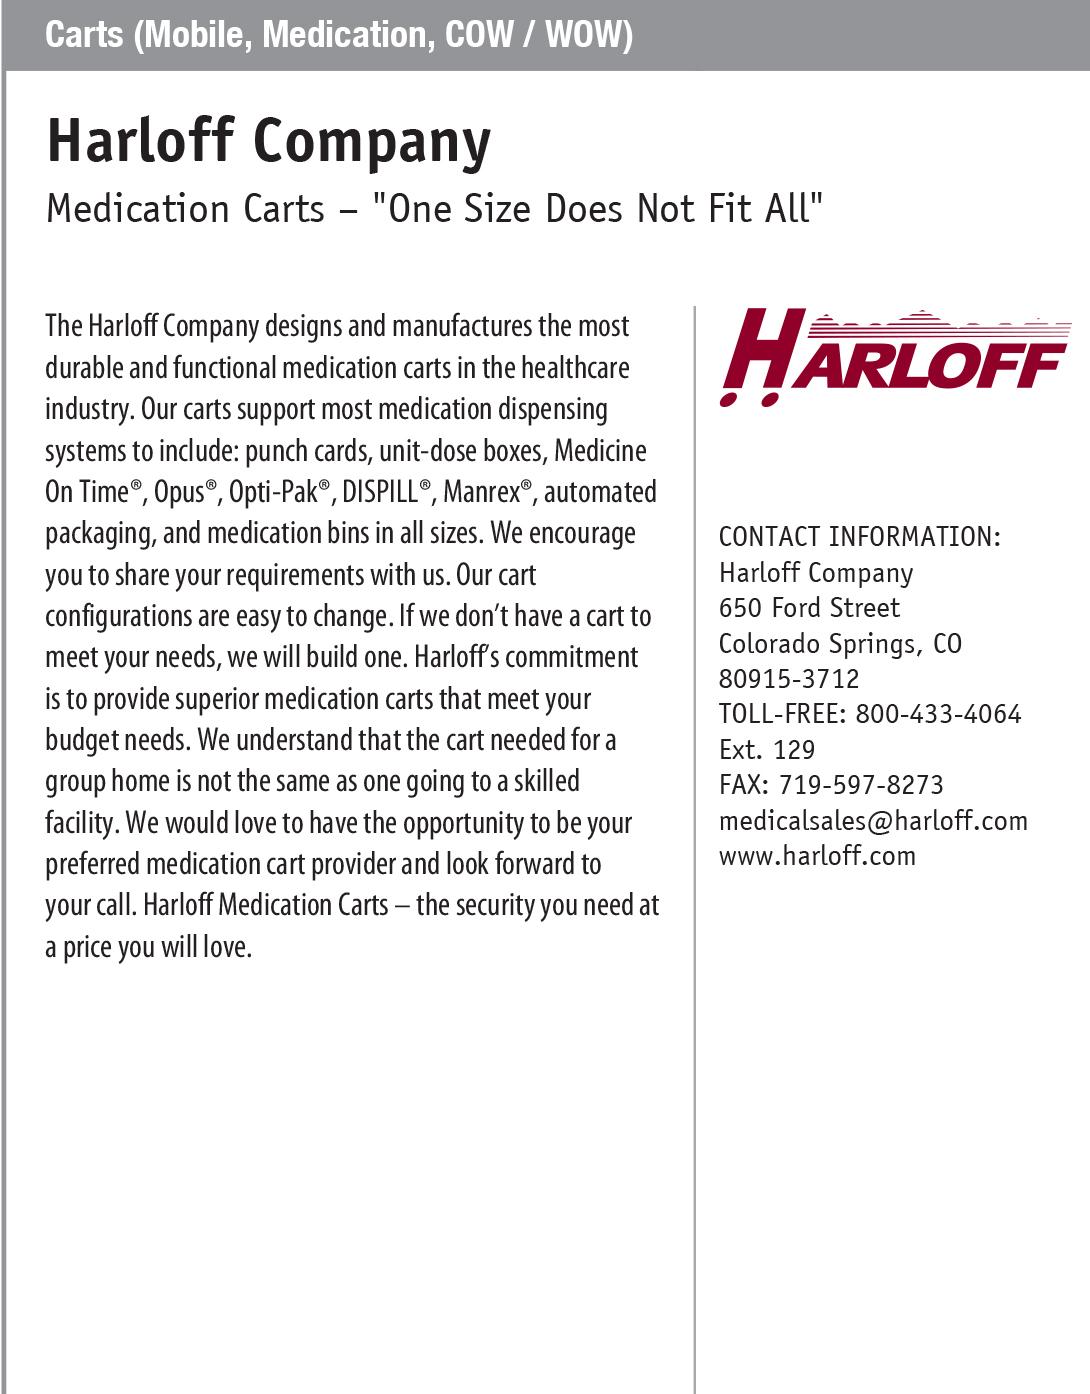 PROFILE_Carts-(Mobile,-Medication,-COW-_-WOW)---Harloff-Company.jpg